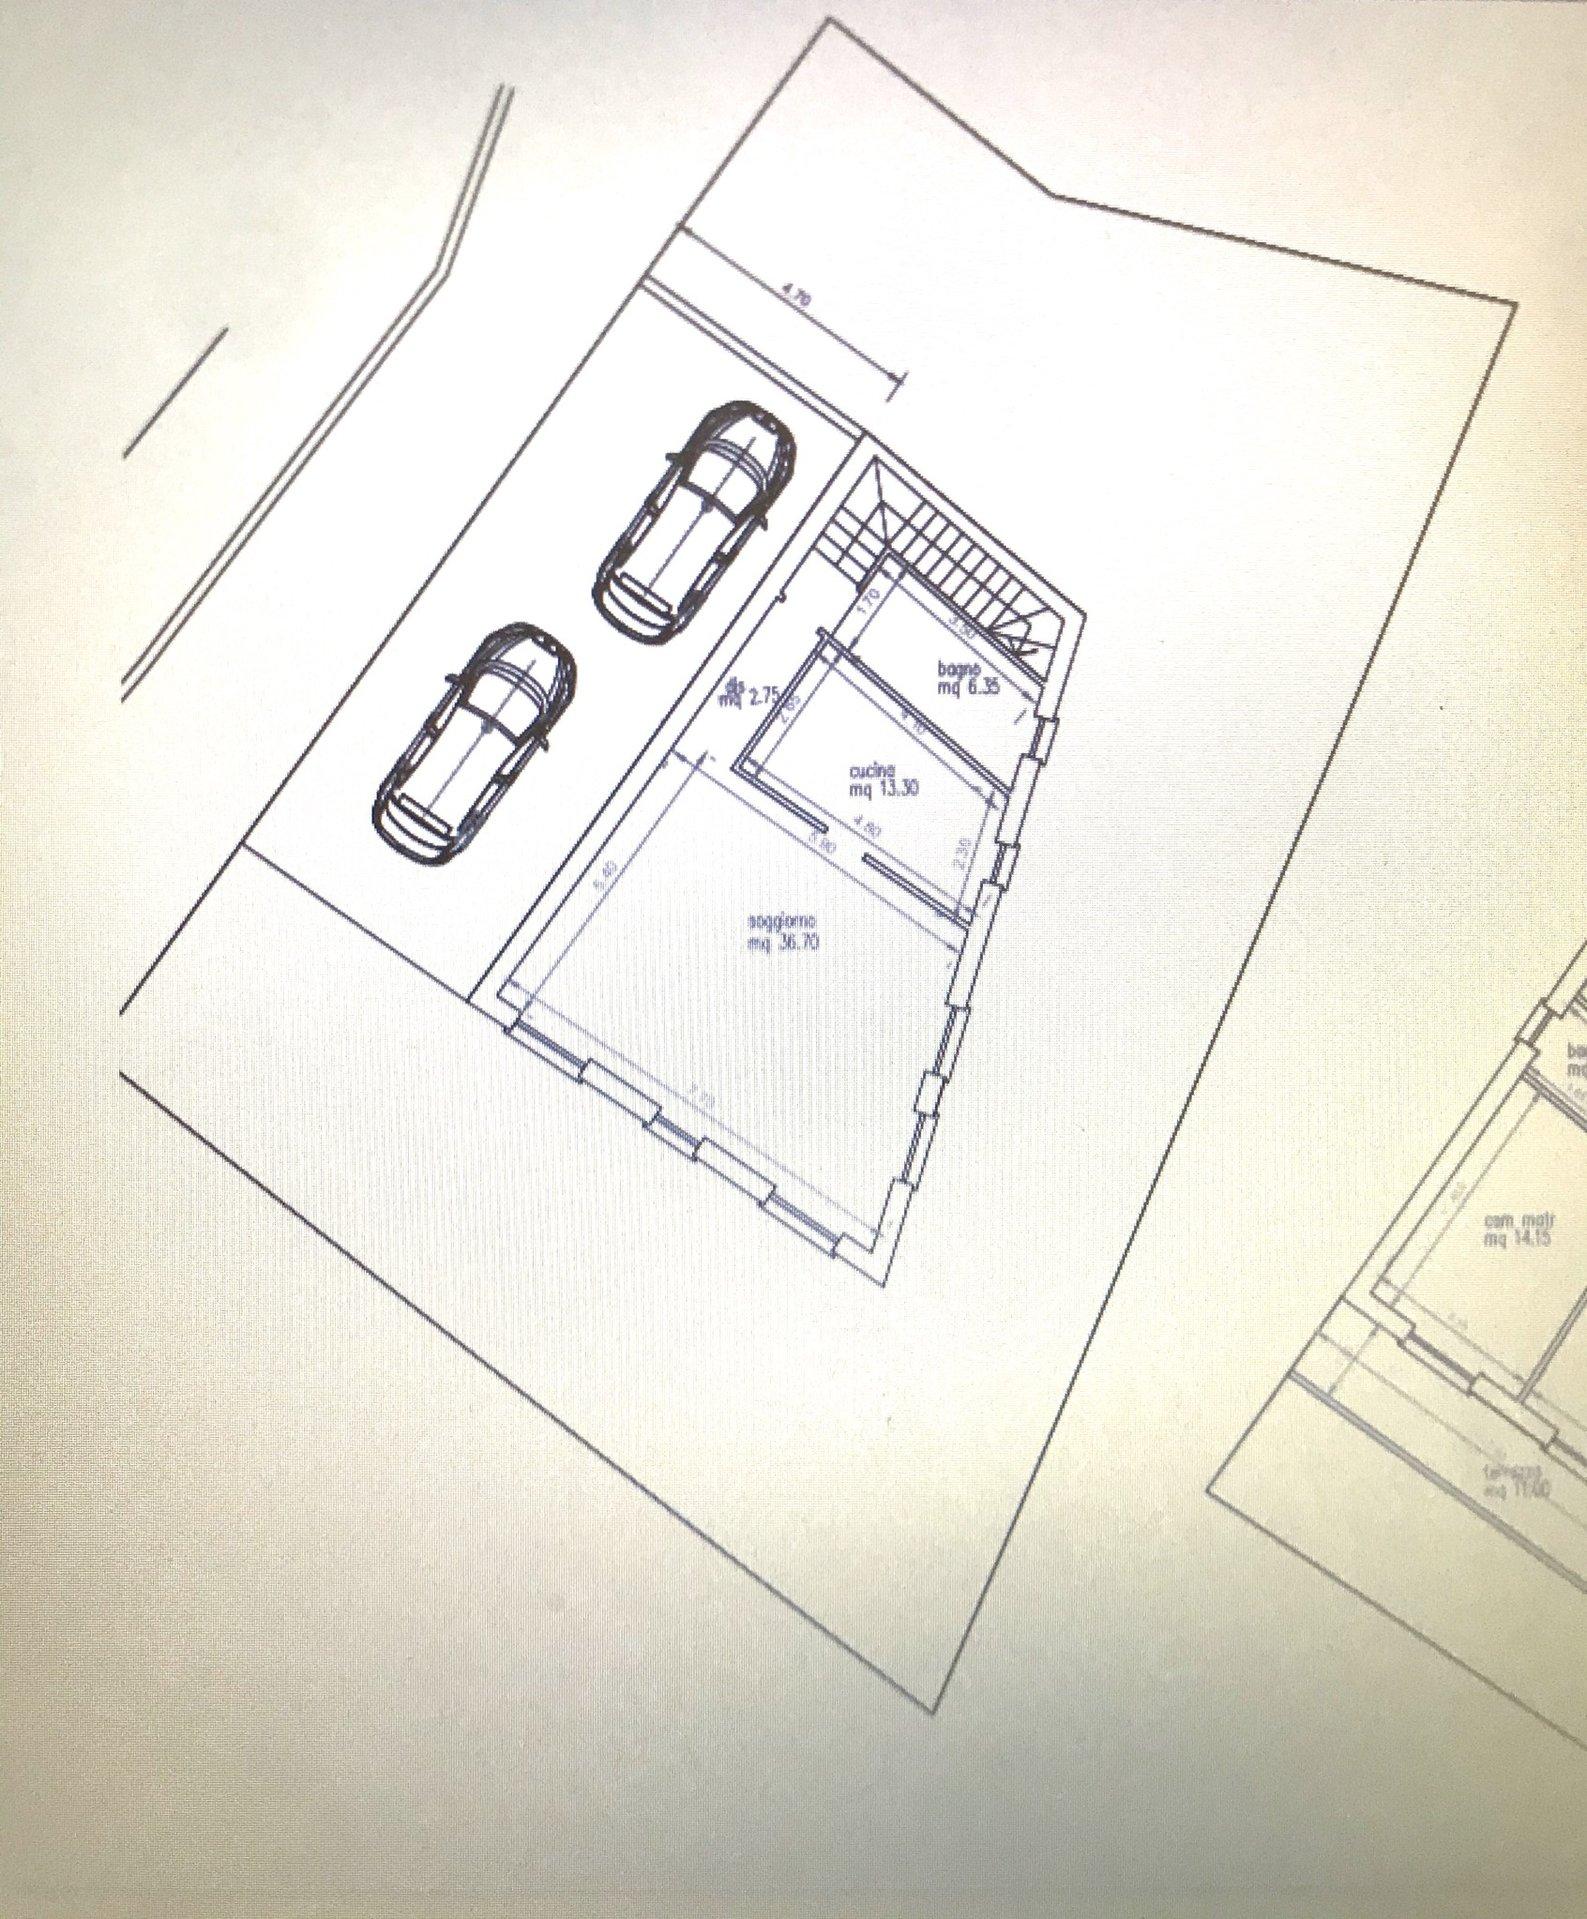 Sale Building land - Faloppio - Italy